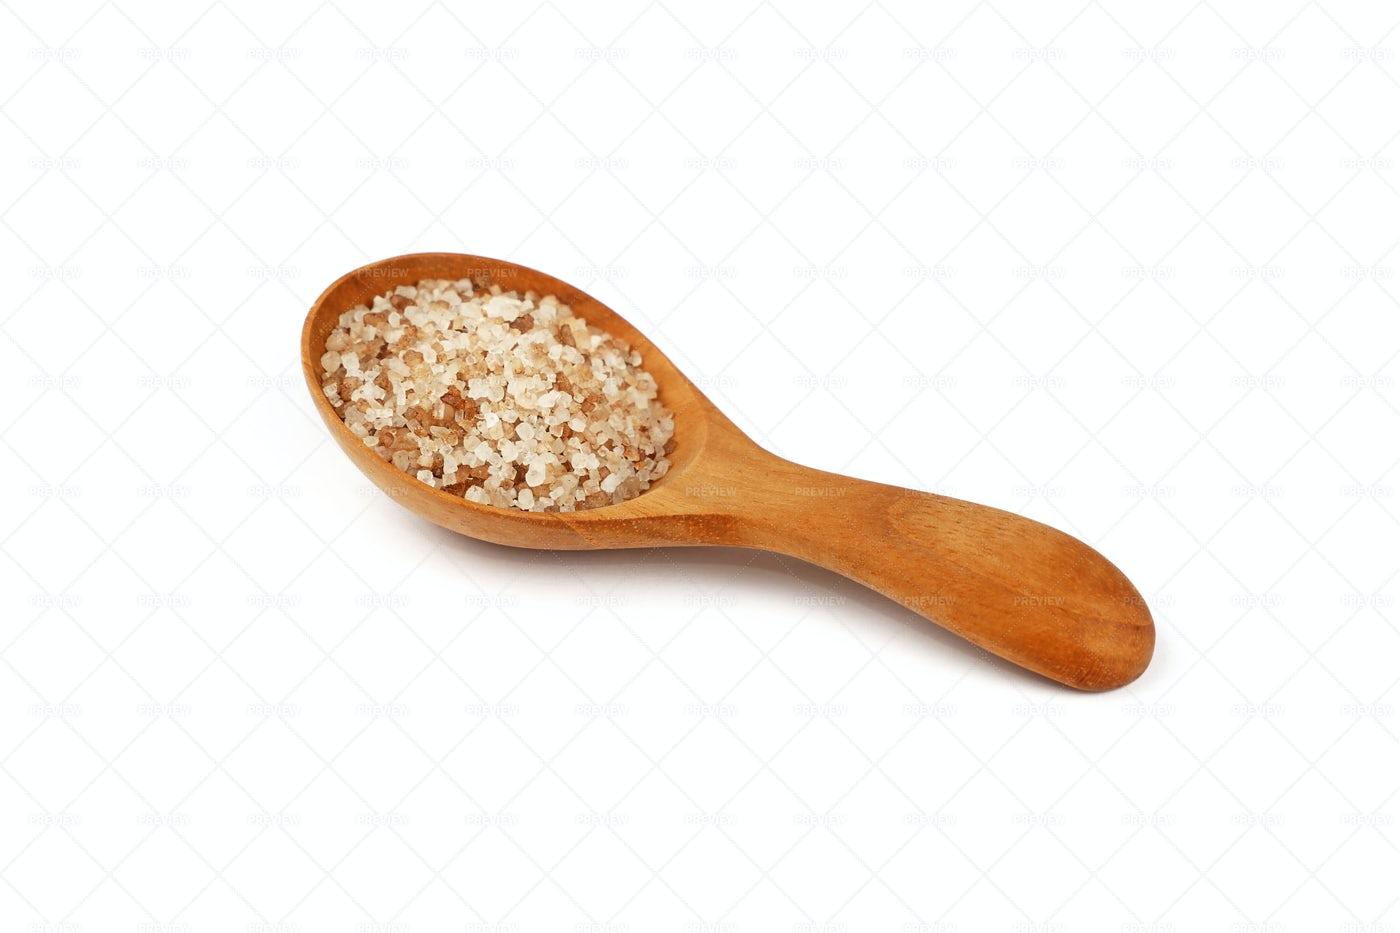 Spoon Of Smoked Danish Salt: Stock Photos